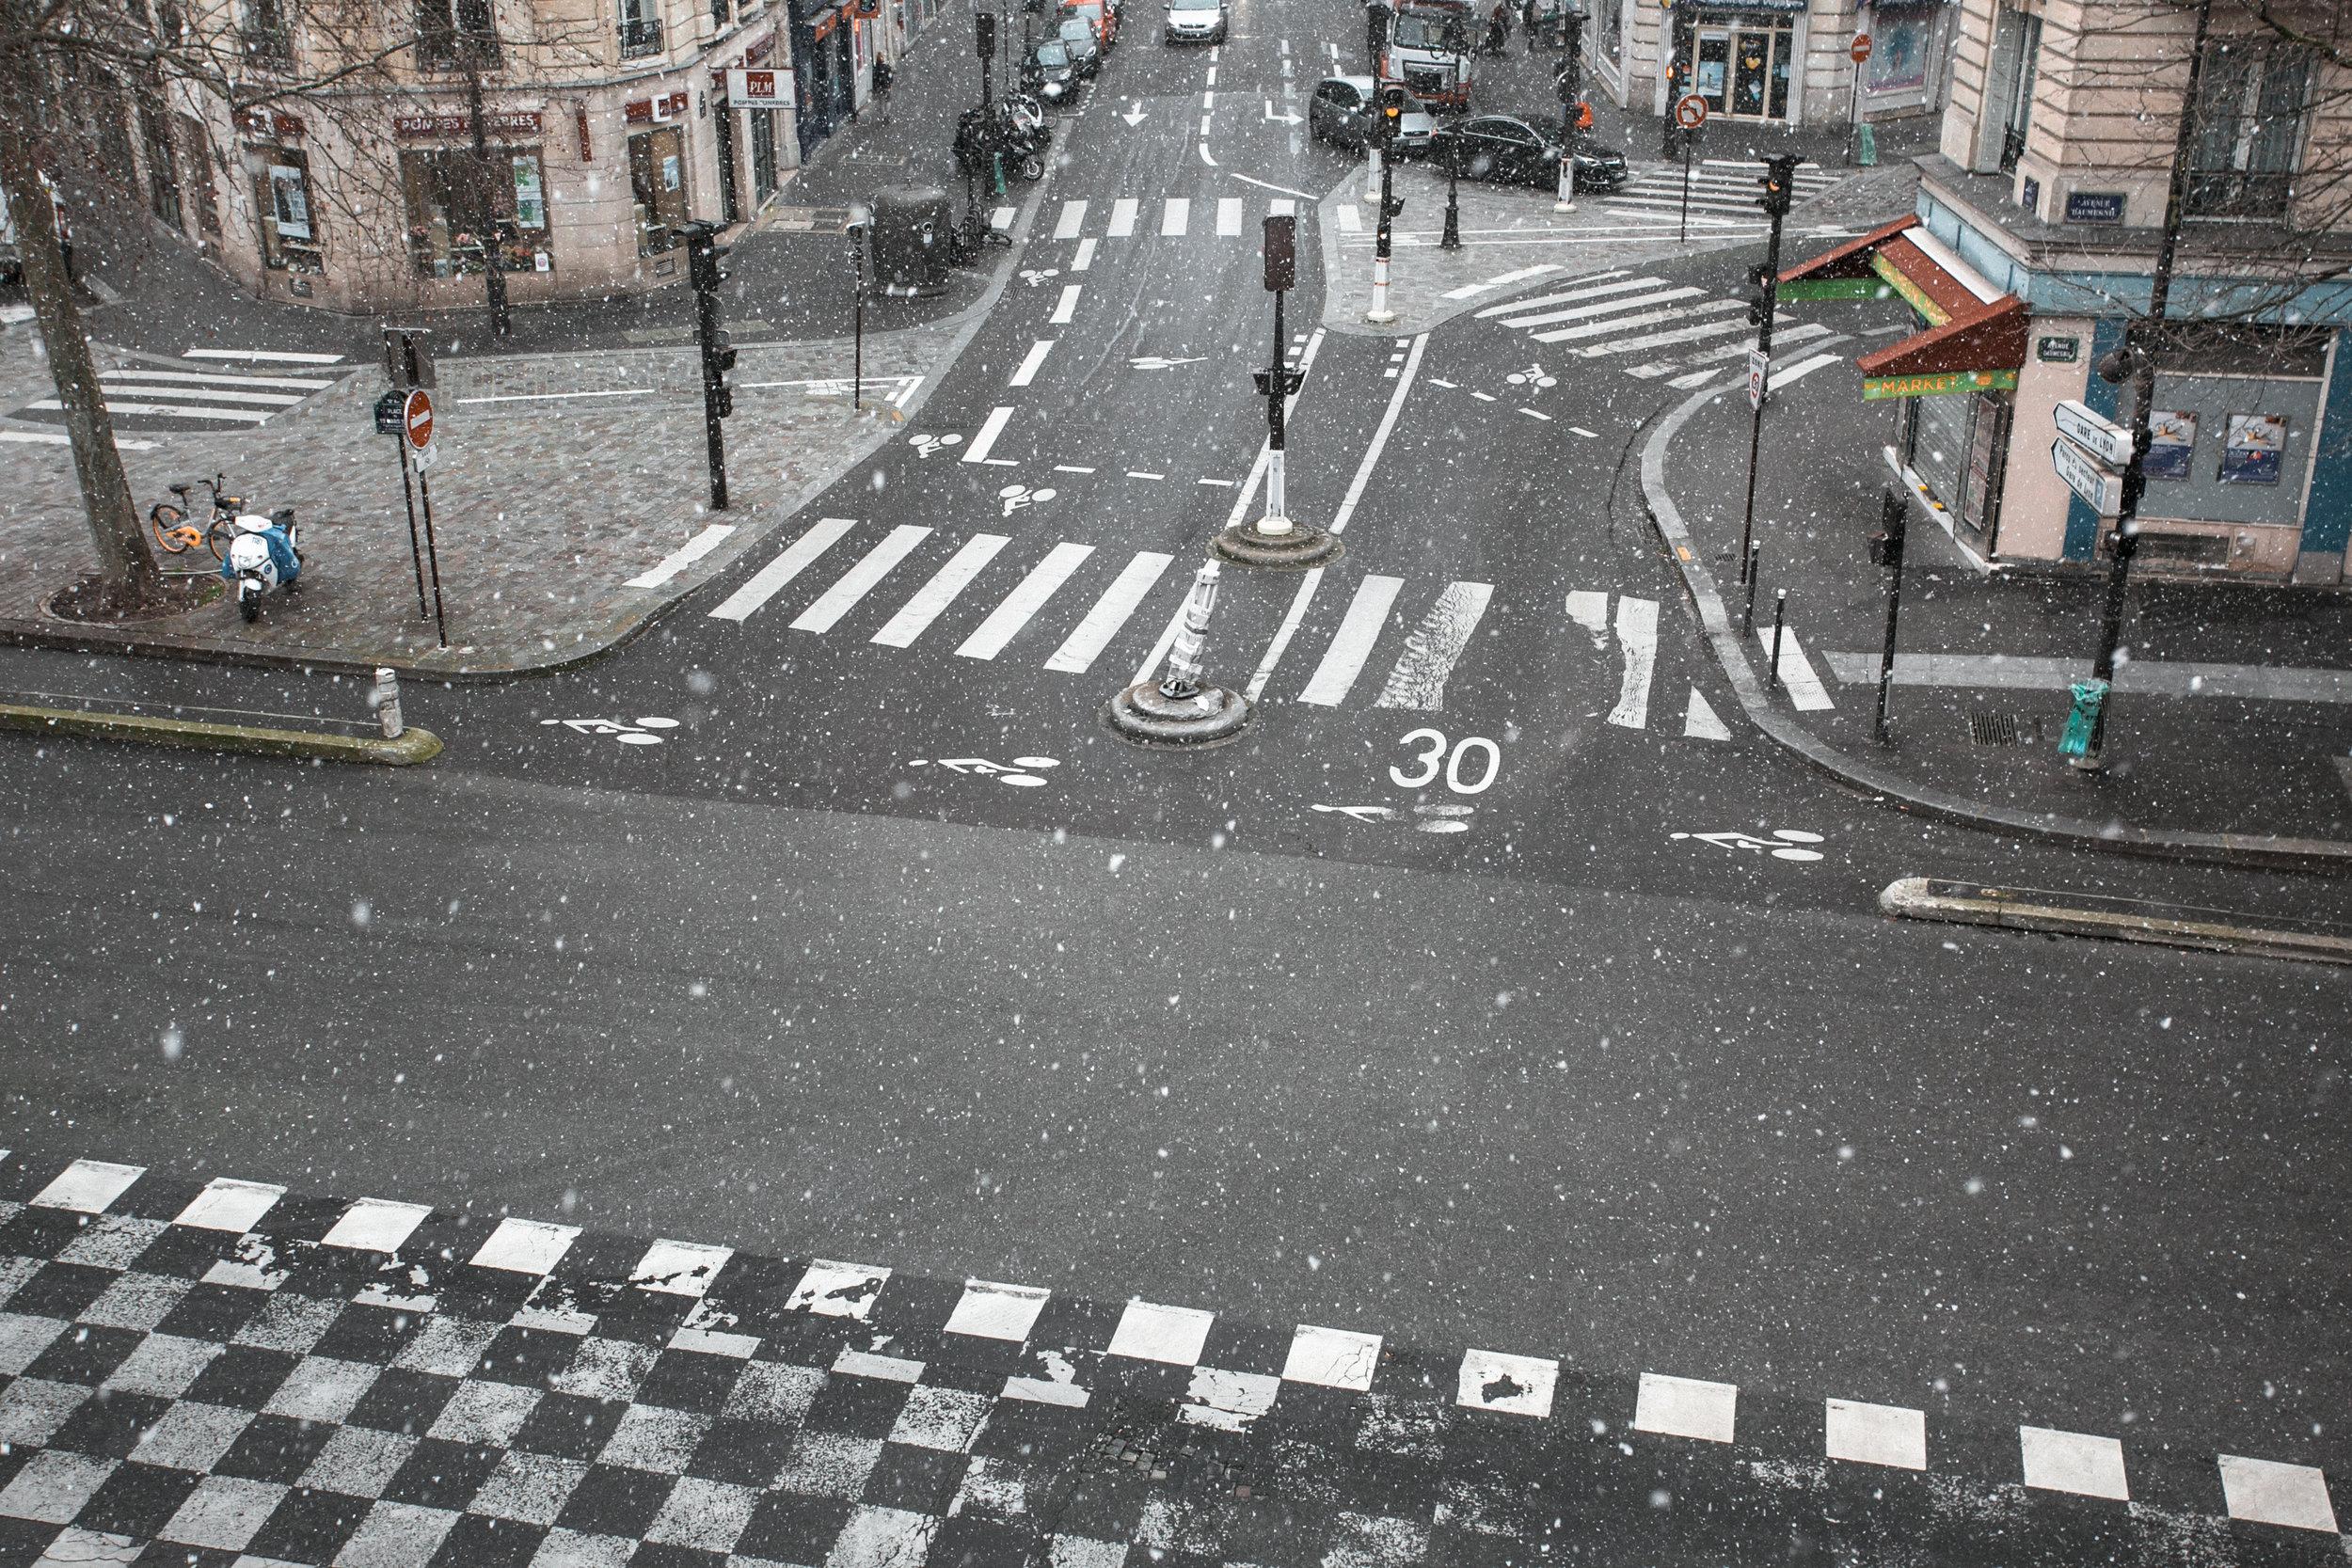 Paris in the Winter by Haarkon. Walking on the Promenade Plantee in the snow.